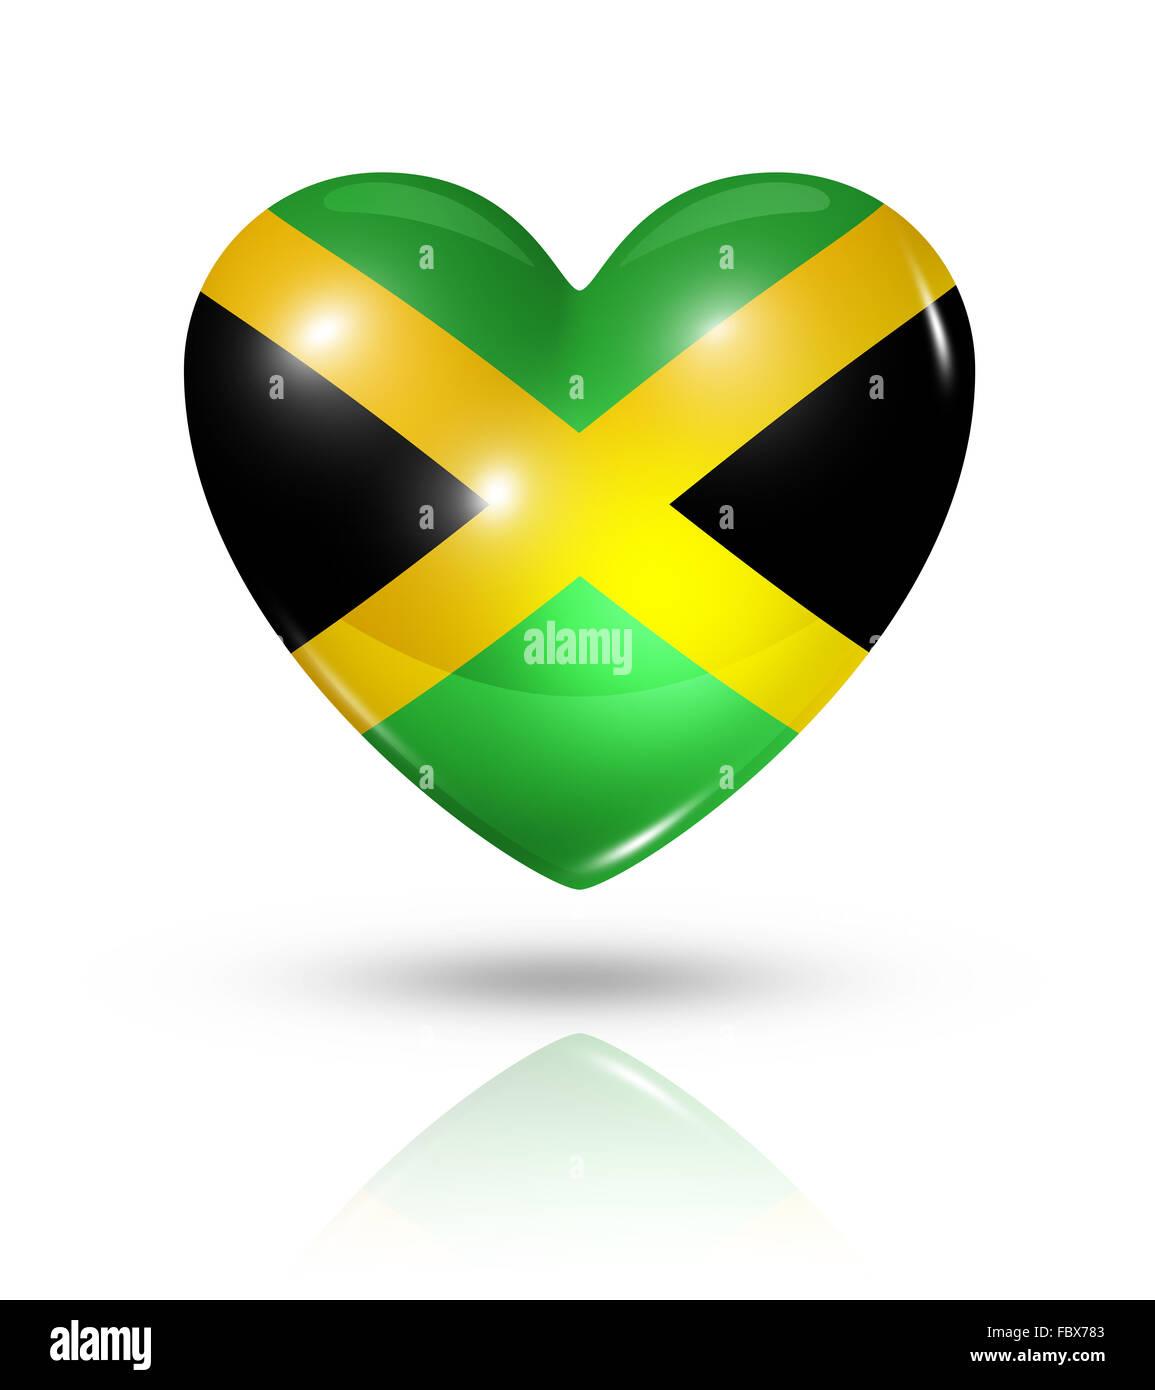 Love jamaica heart flag icon stock image